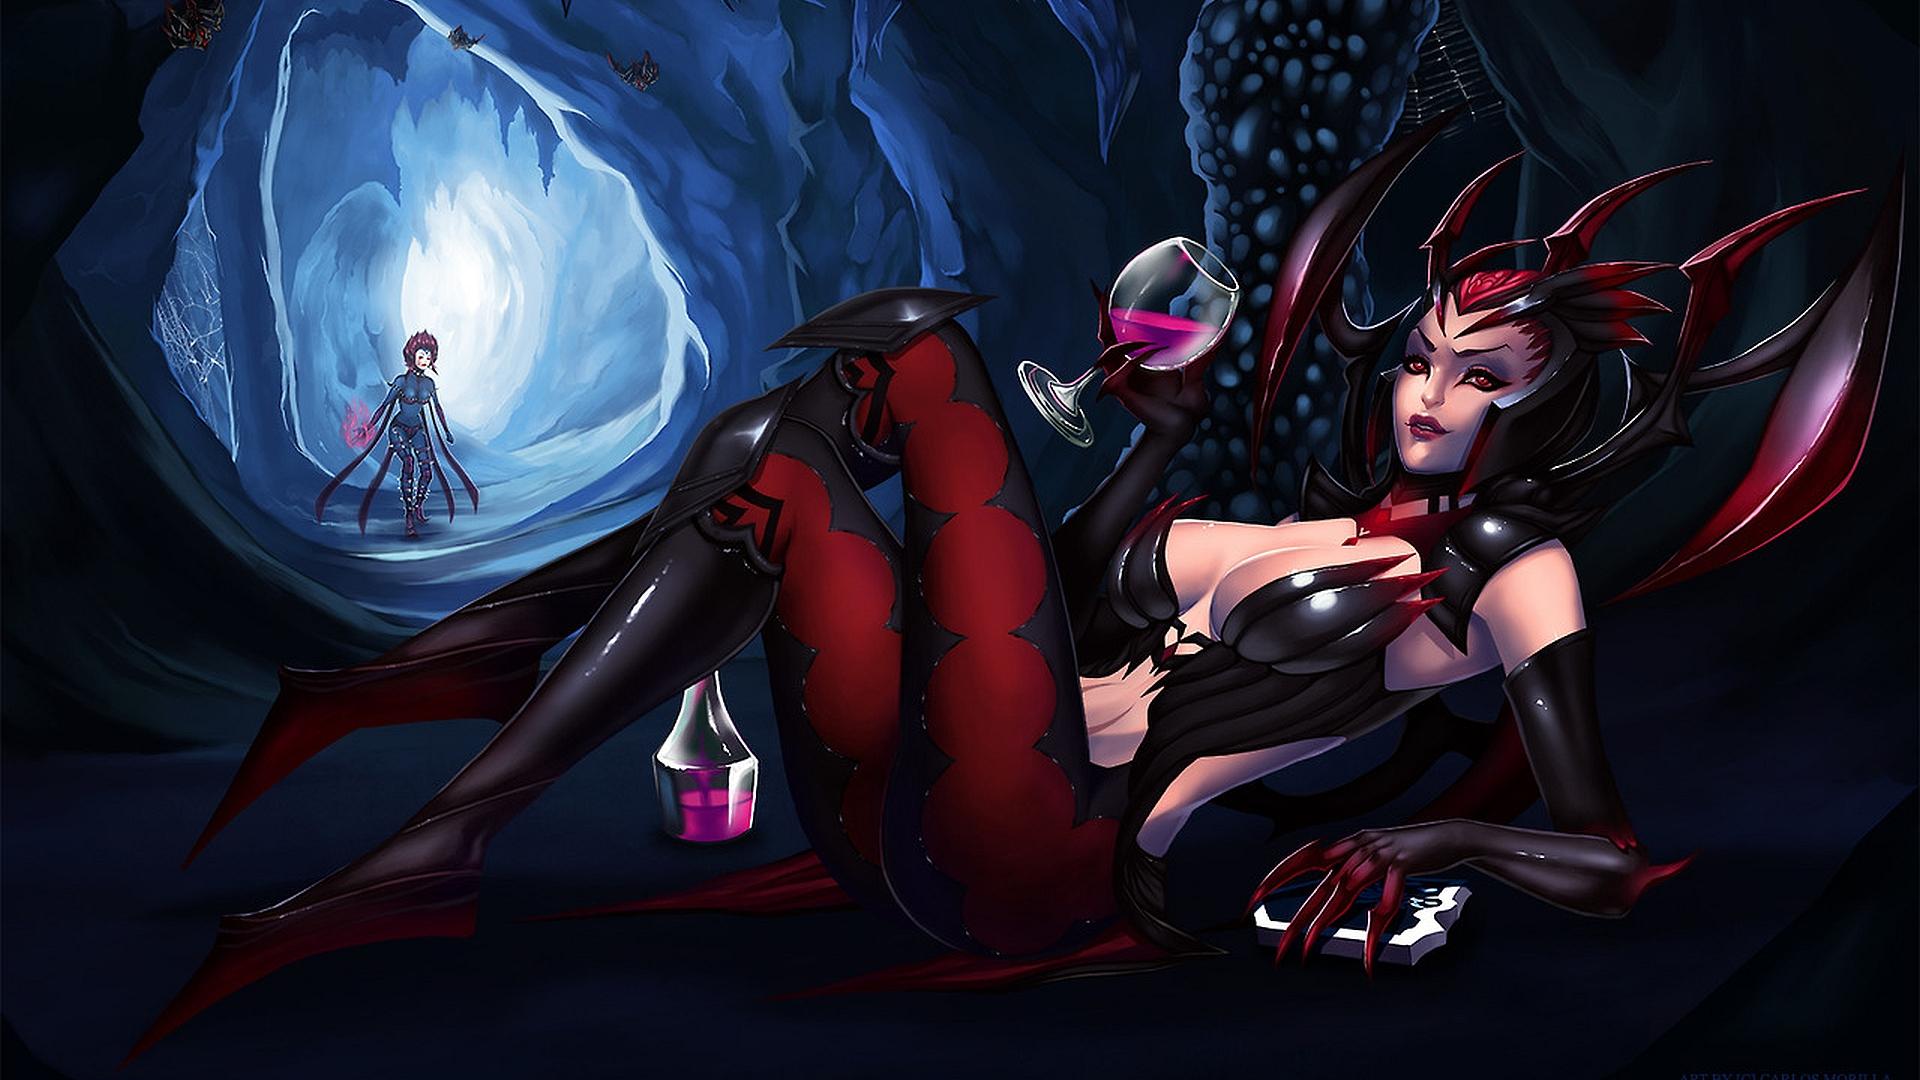 Video Game League Of Legends Evelynn Elise Wallpaper